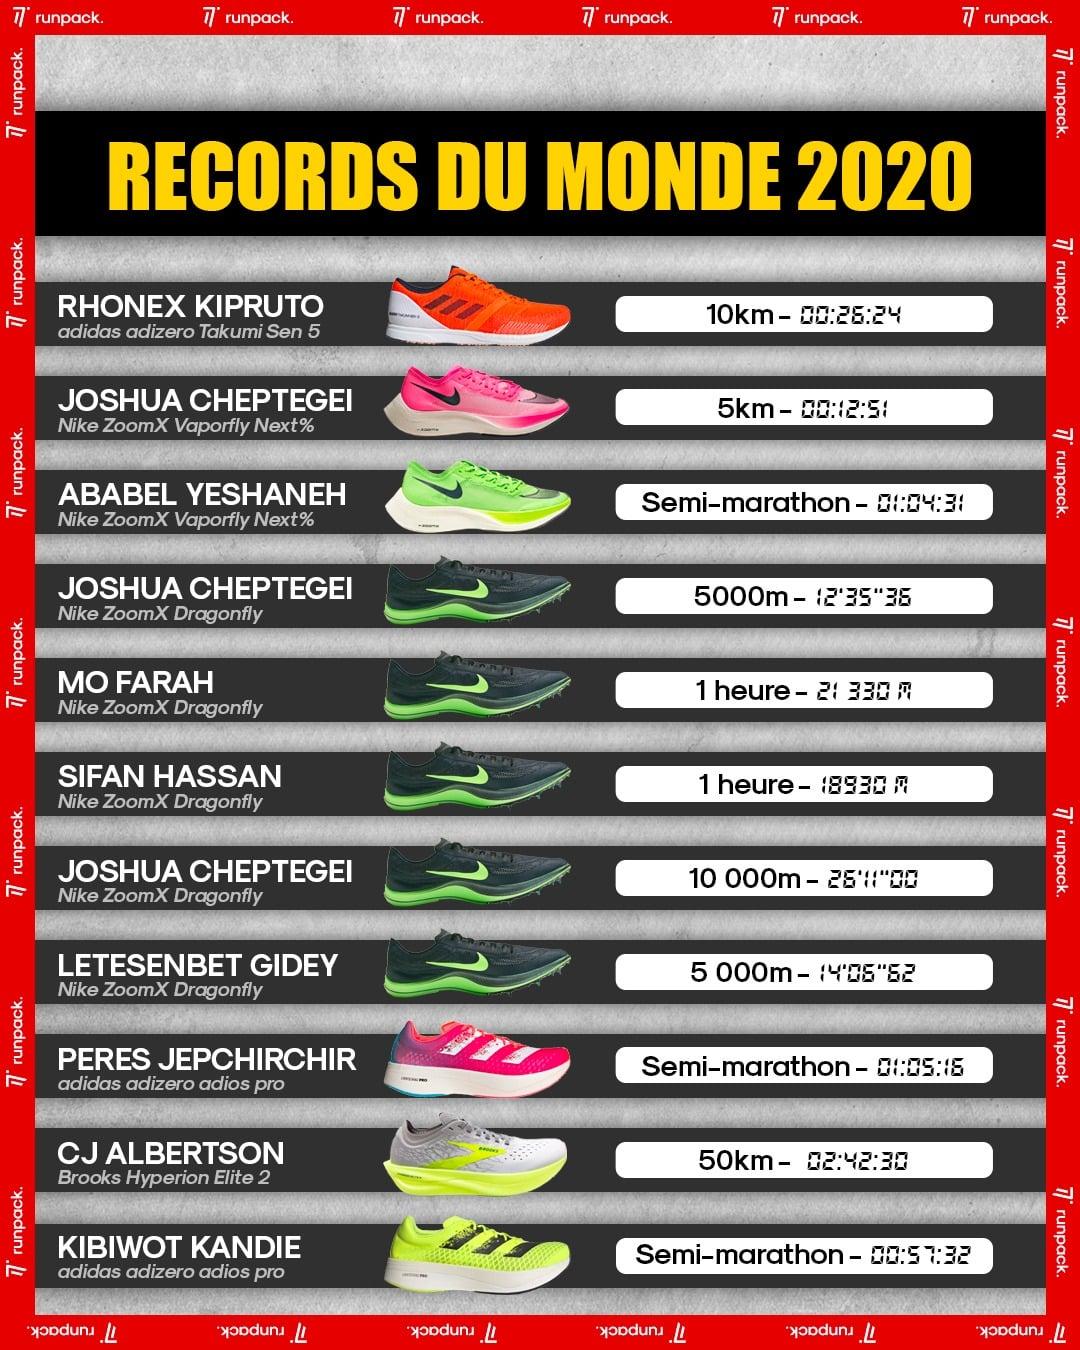 infographie-chaussures-des-records-2020-running-runpack